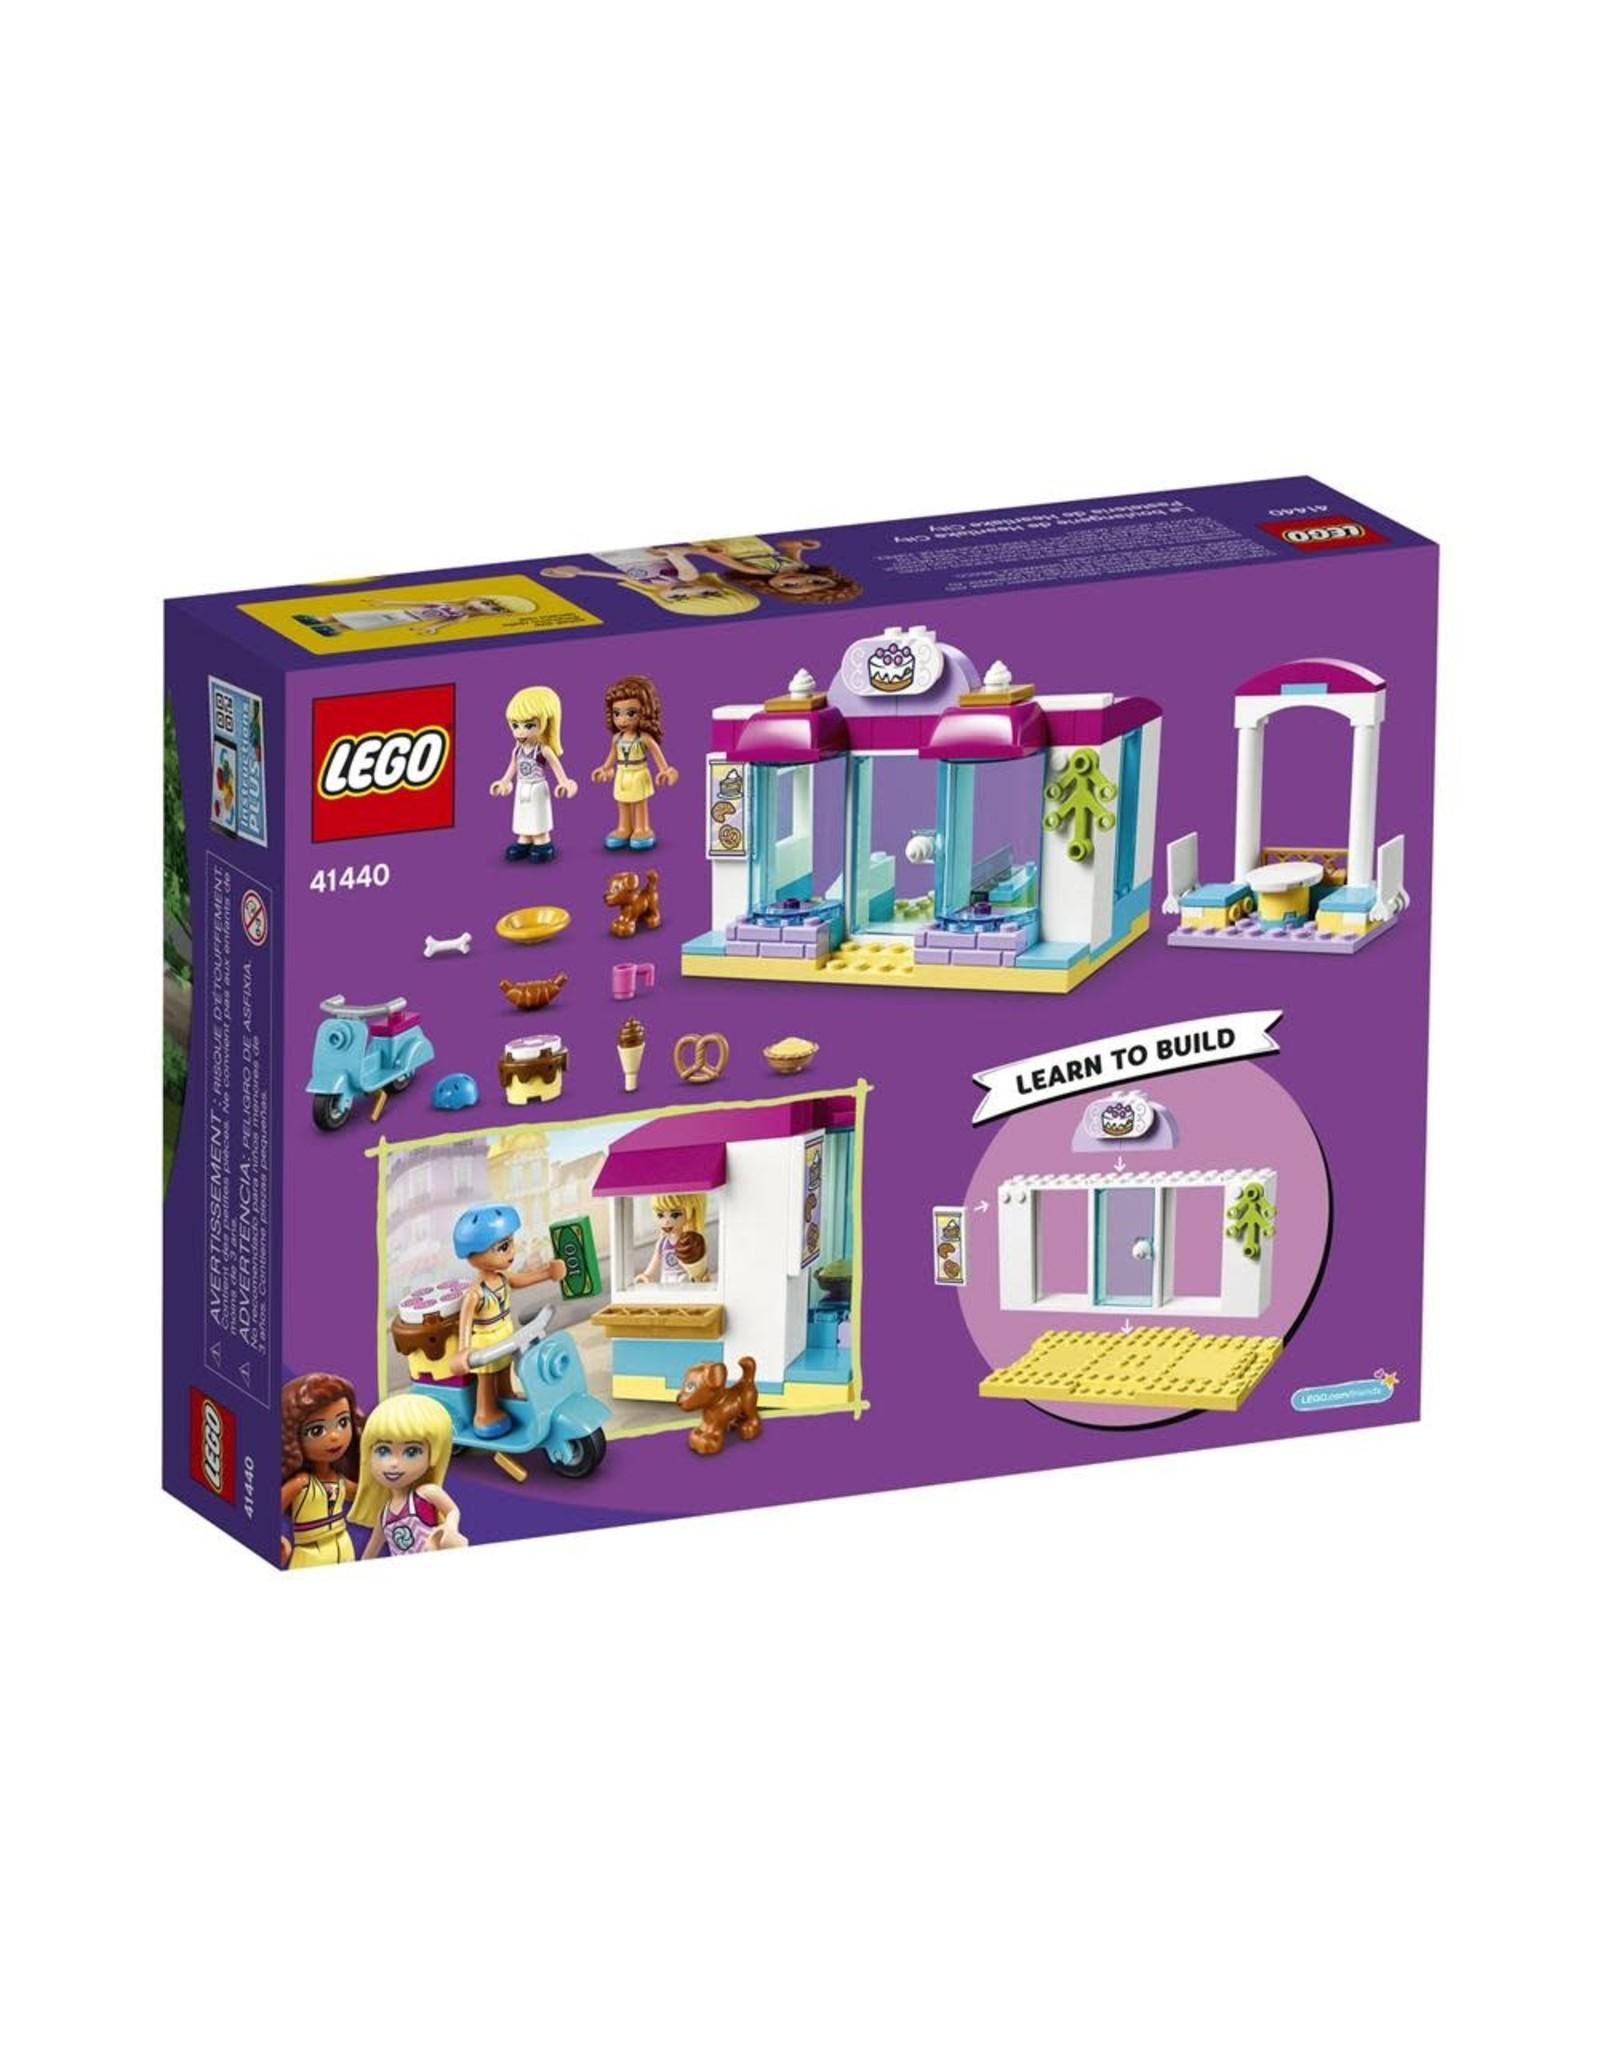 LEGO Friends 41440 Heartlake City Bakery